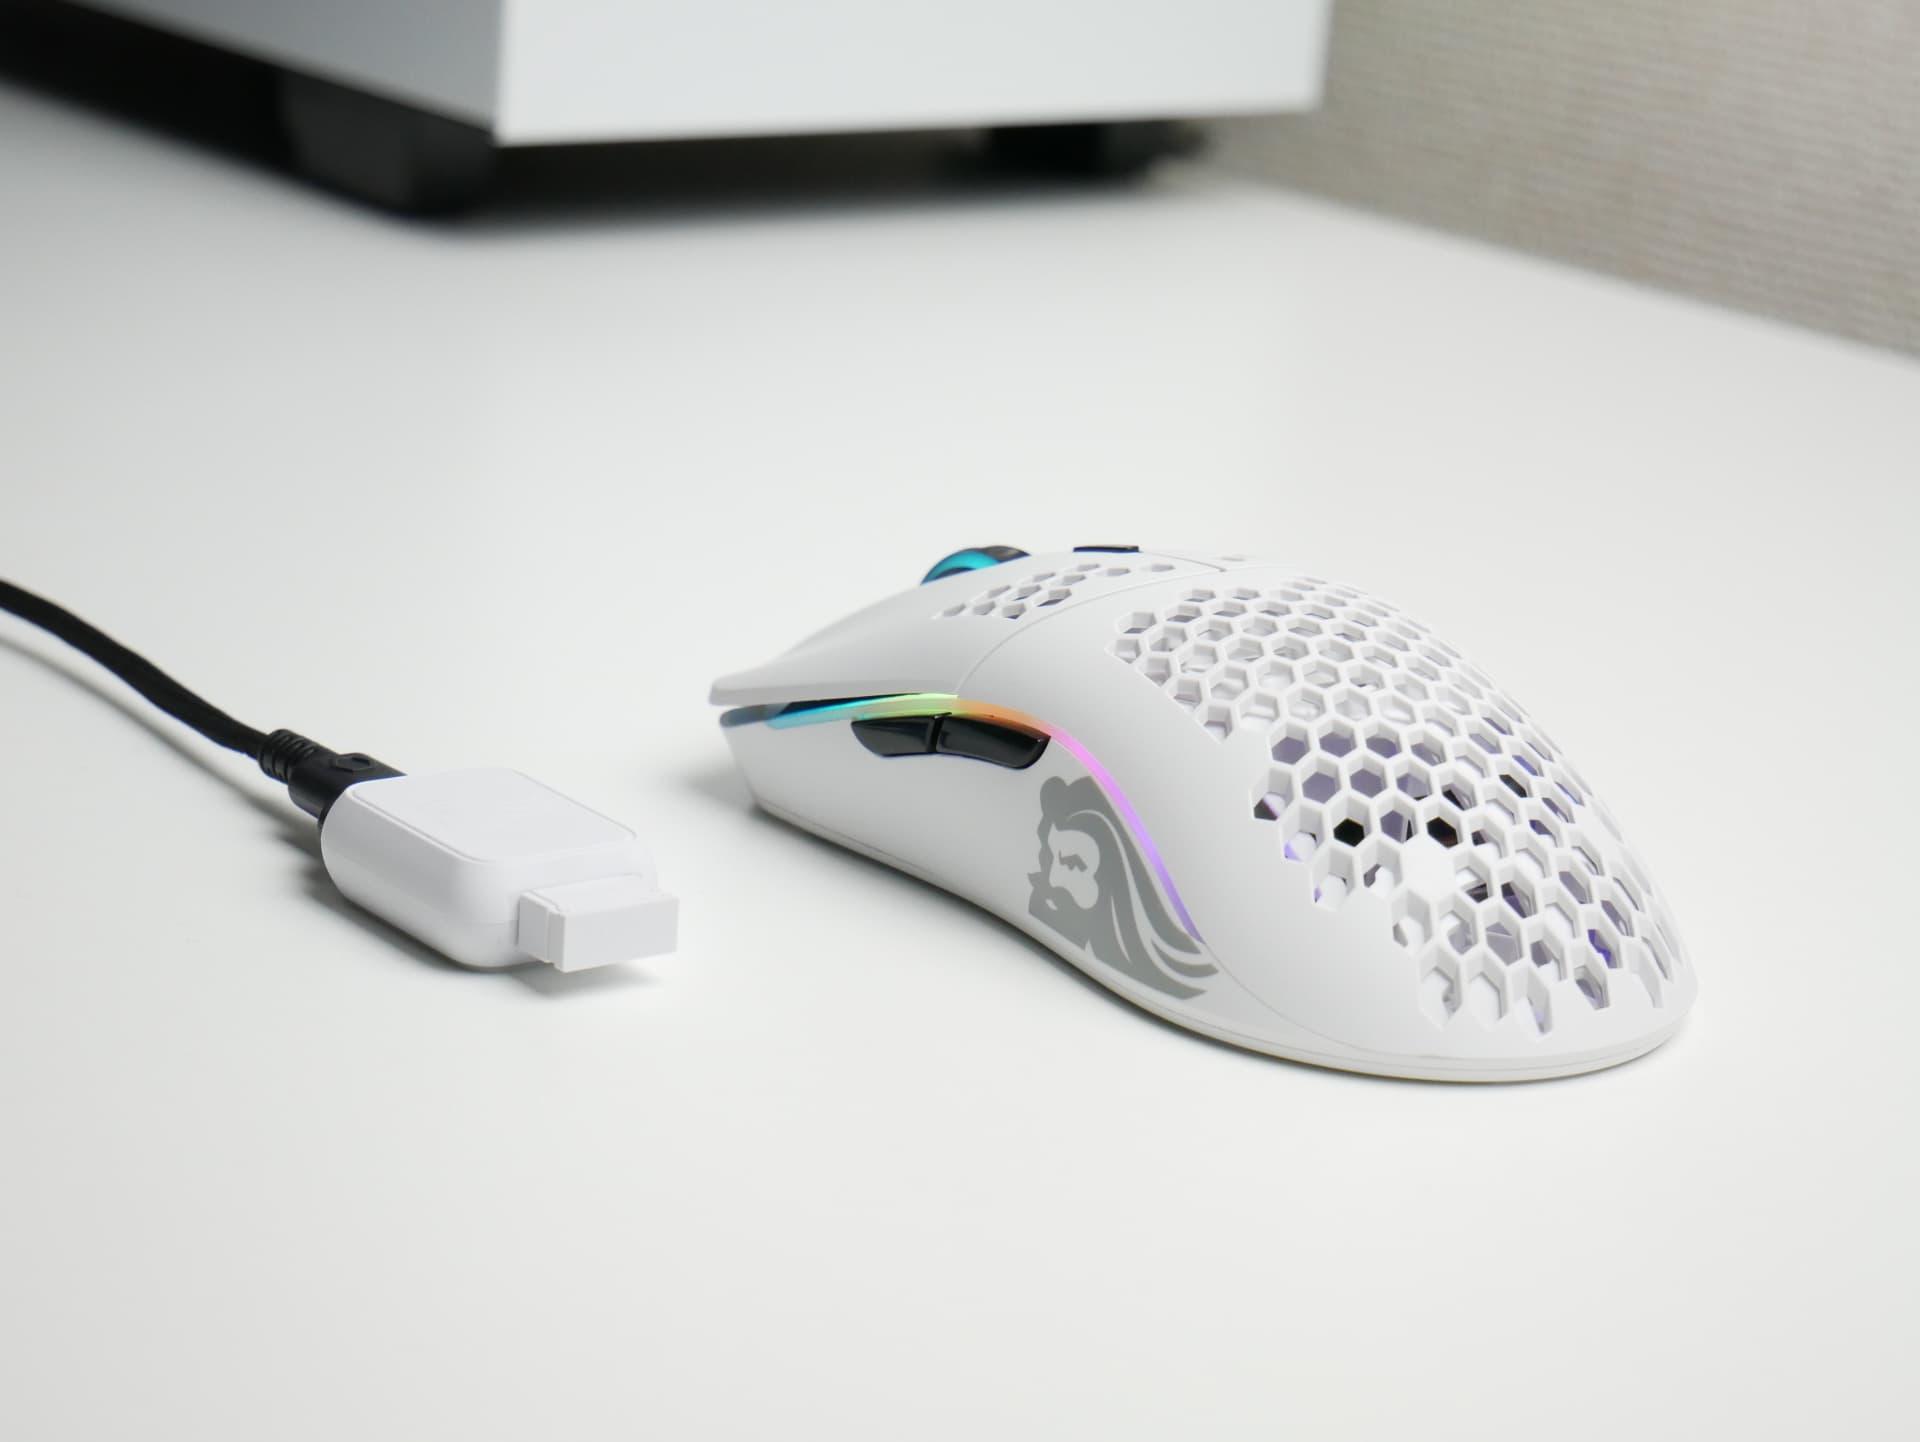 「Glorious Model O Wireless」レビュー。安価かつ高クオリティな無線ゲーミングマウス